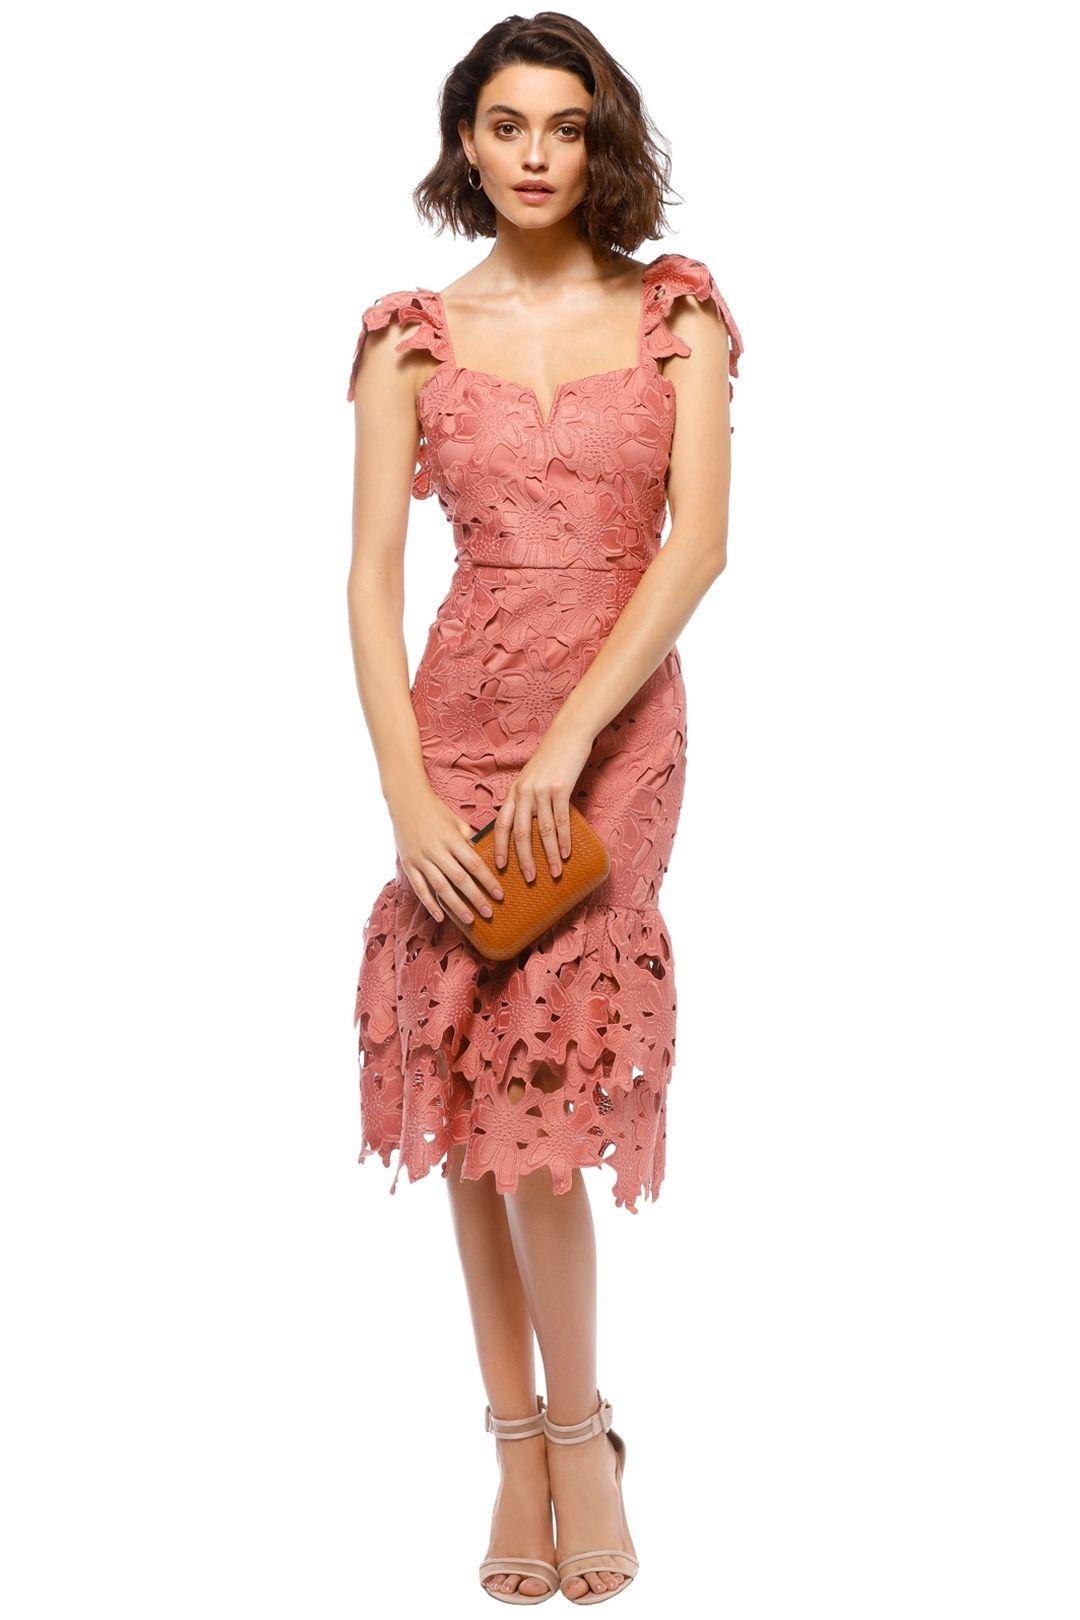 Saylor - Donna Dress - Terracotta - Front